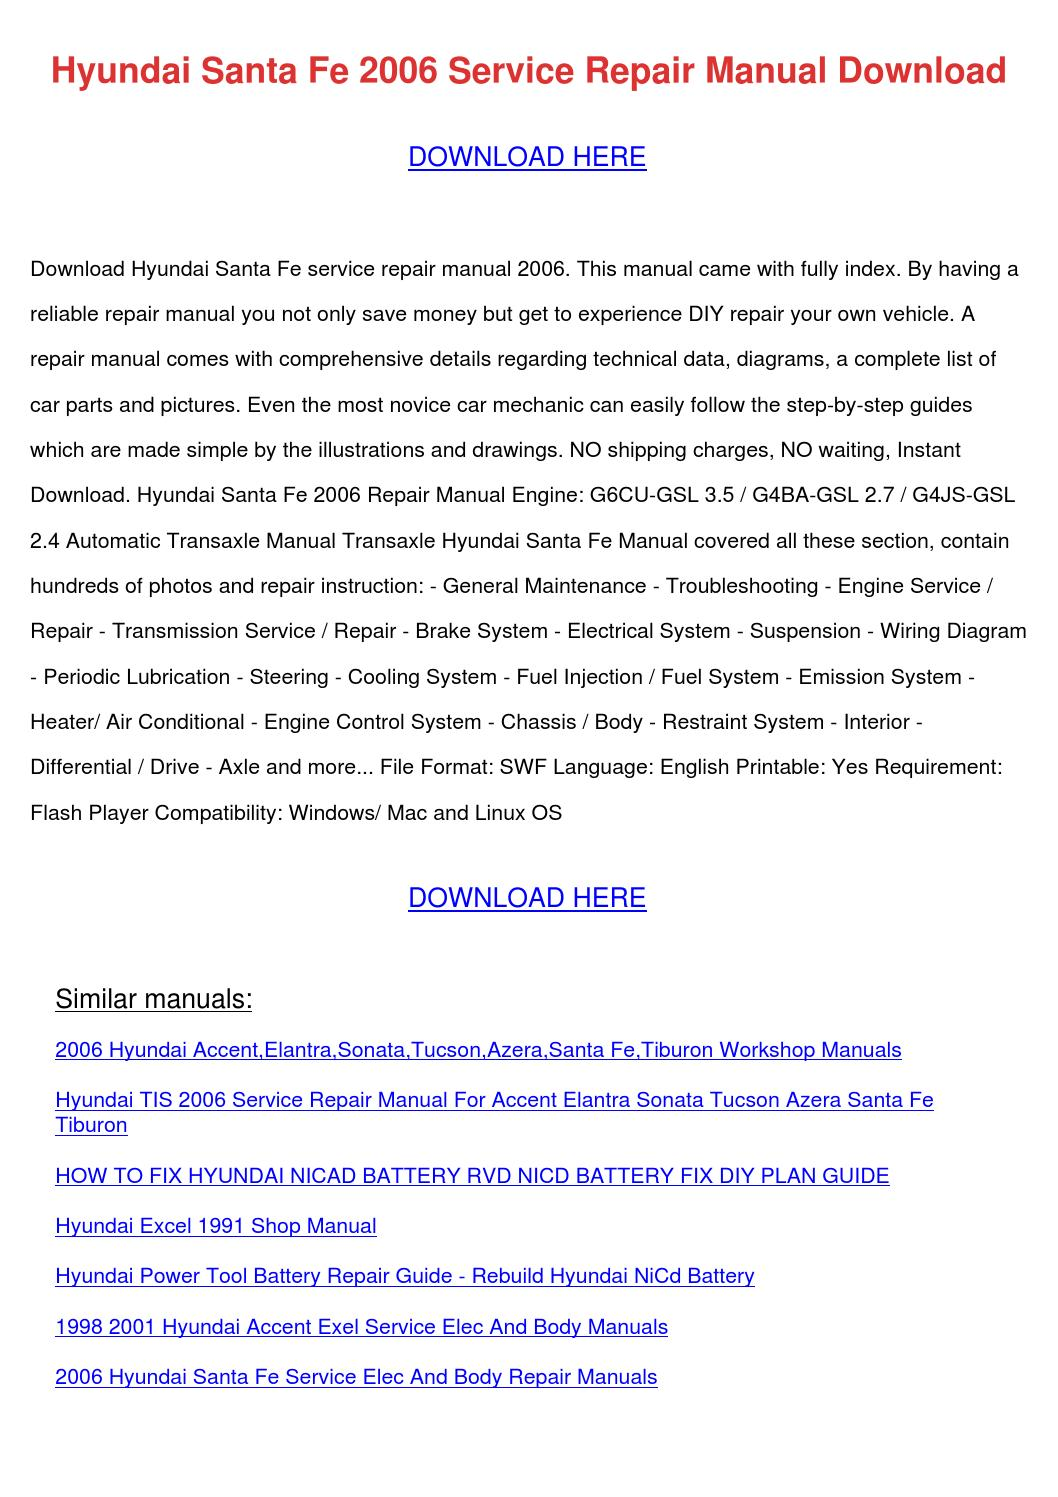 Hyundai Santa Fe 2006 Service Repair Manual D by SondraShockley ...